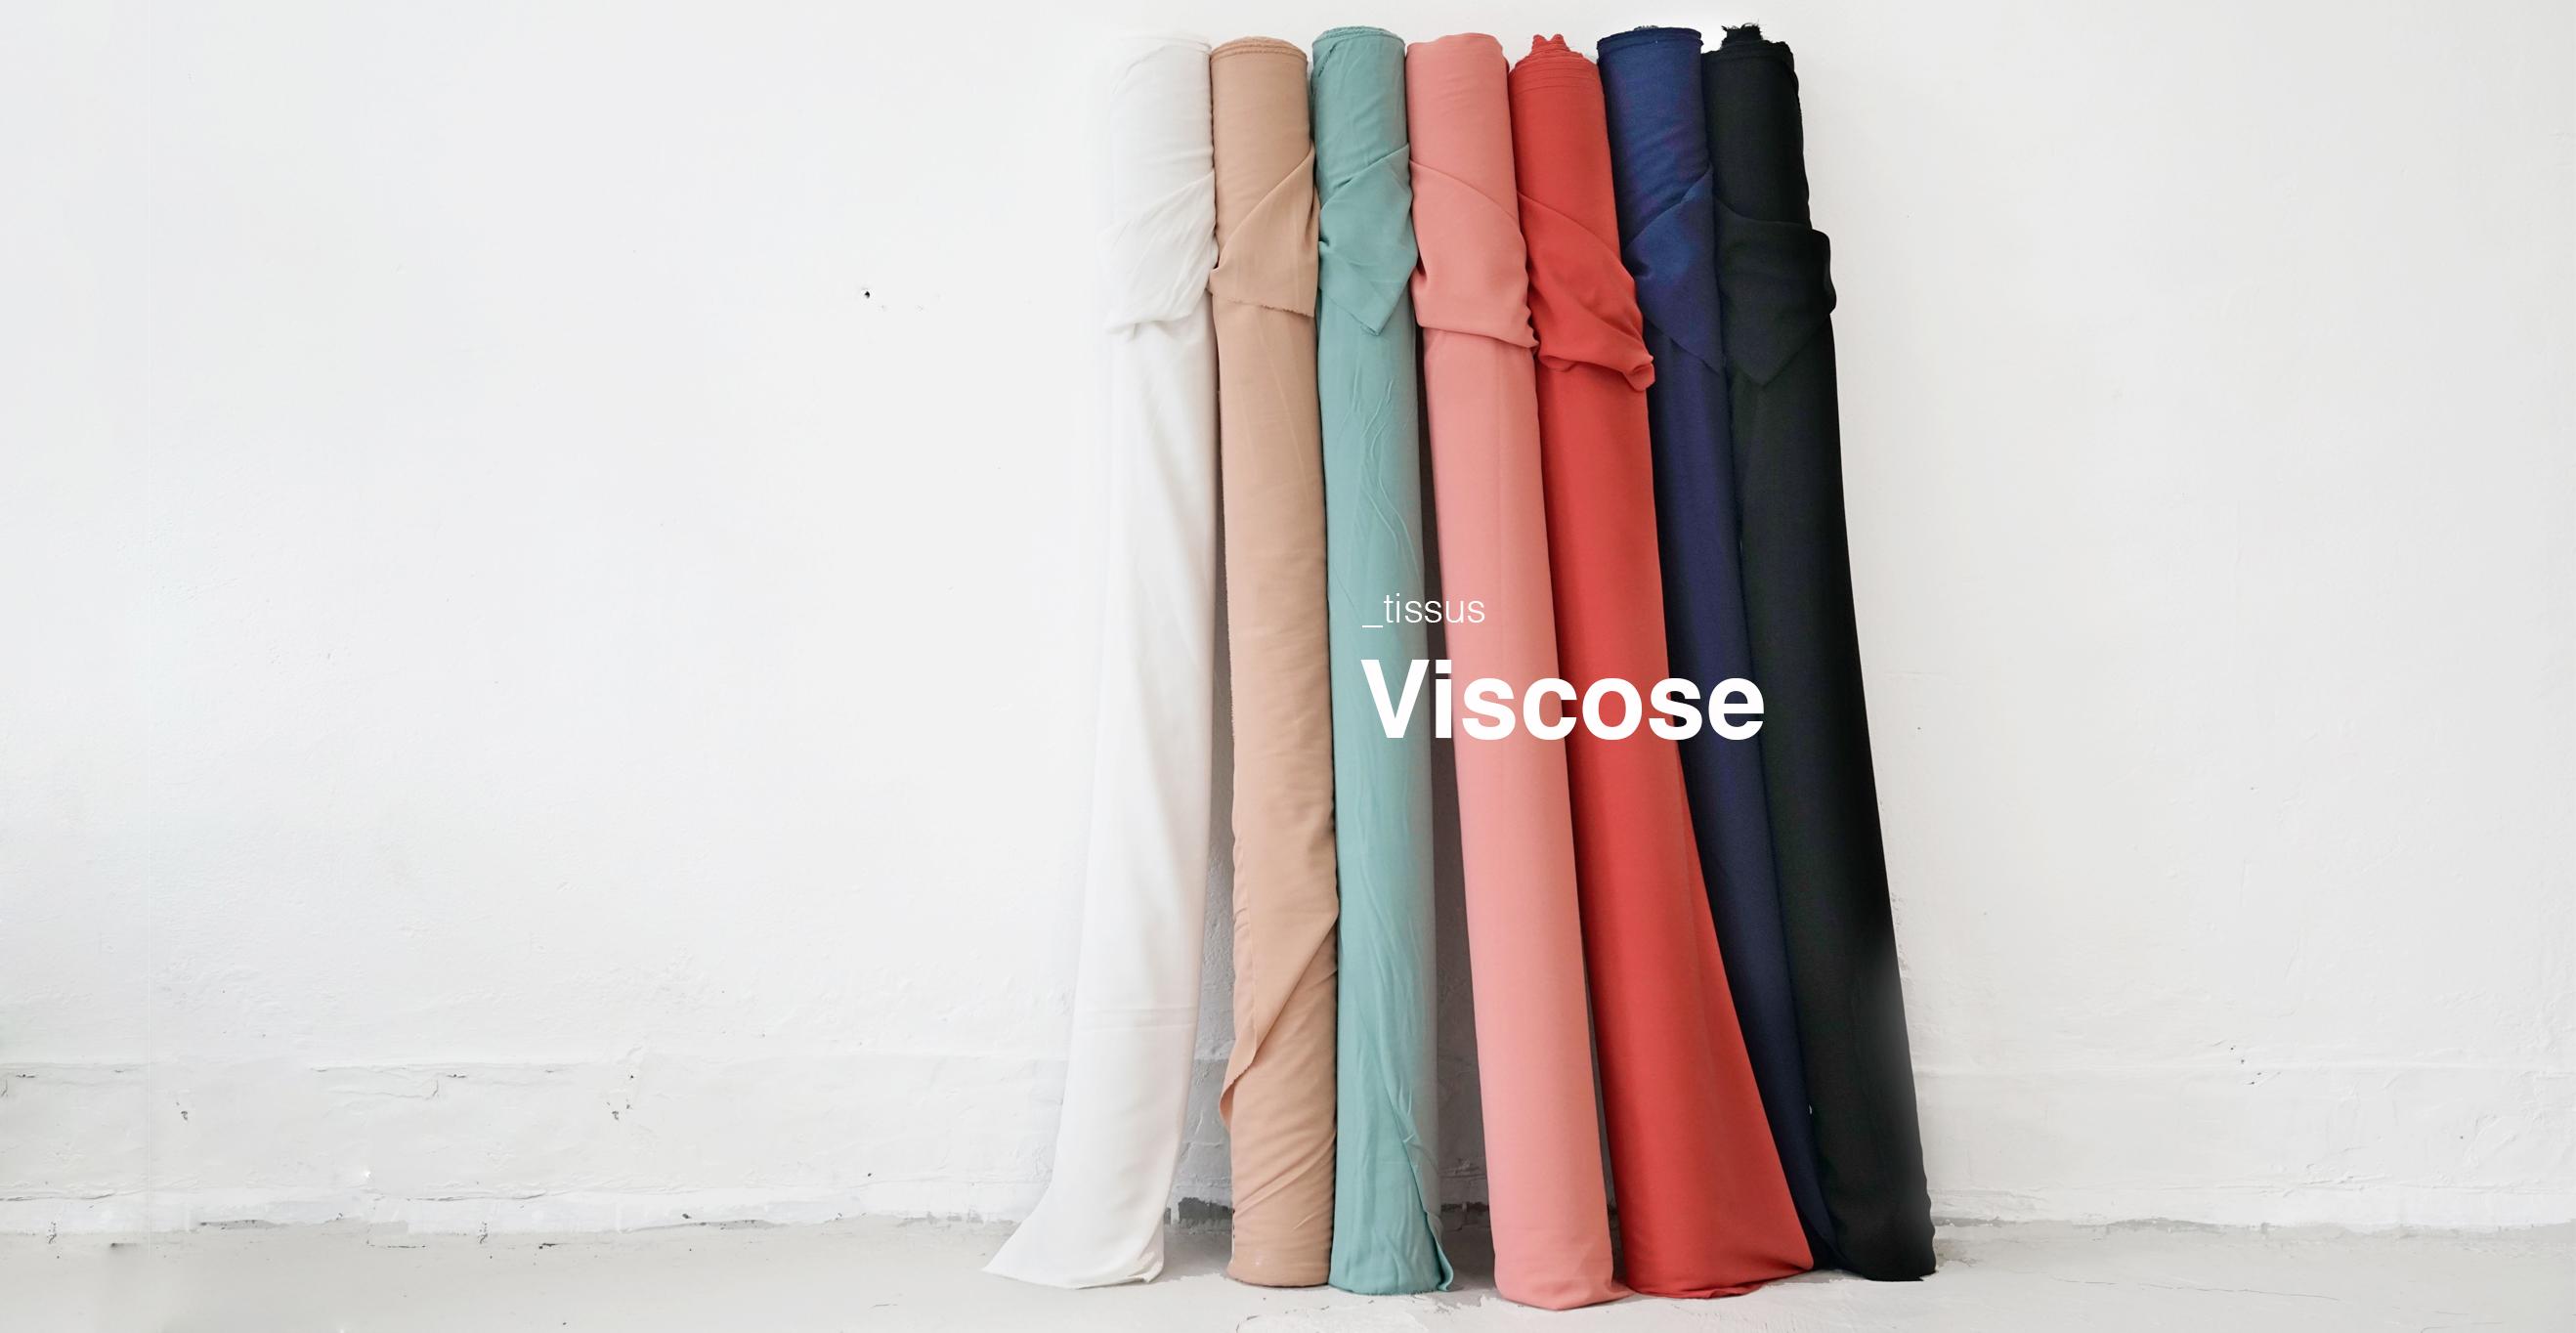 Pretty Blog - blog couture - tissus viscose tout terrain - conseil couture